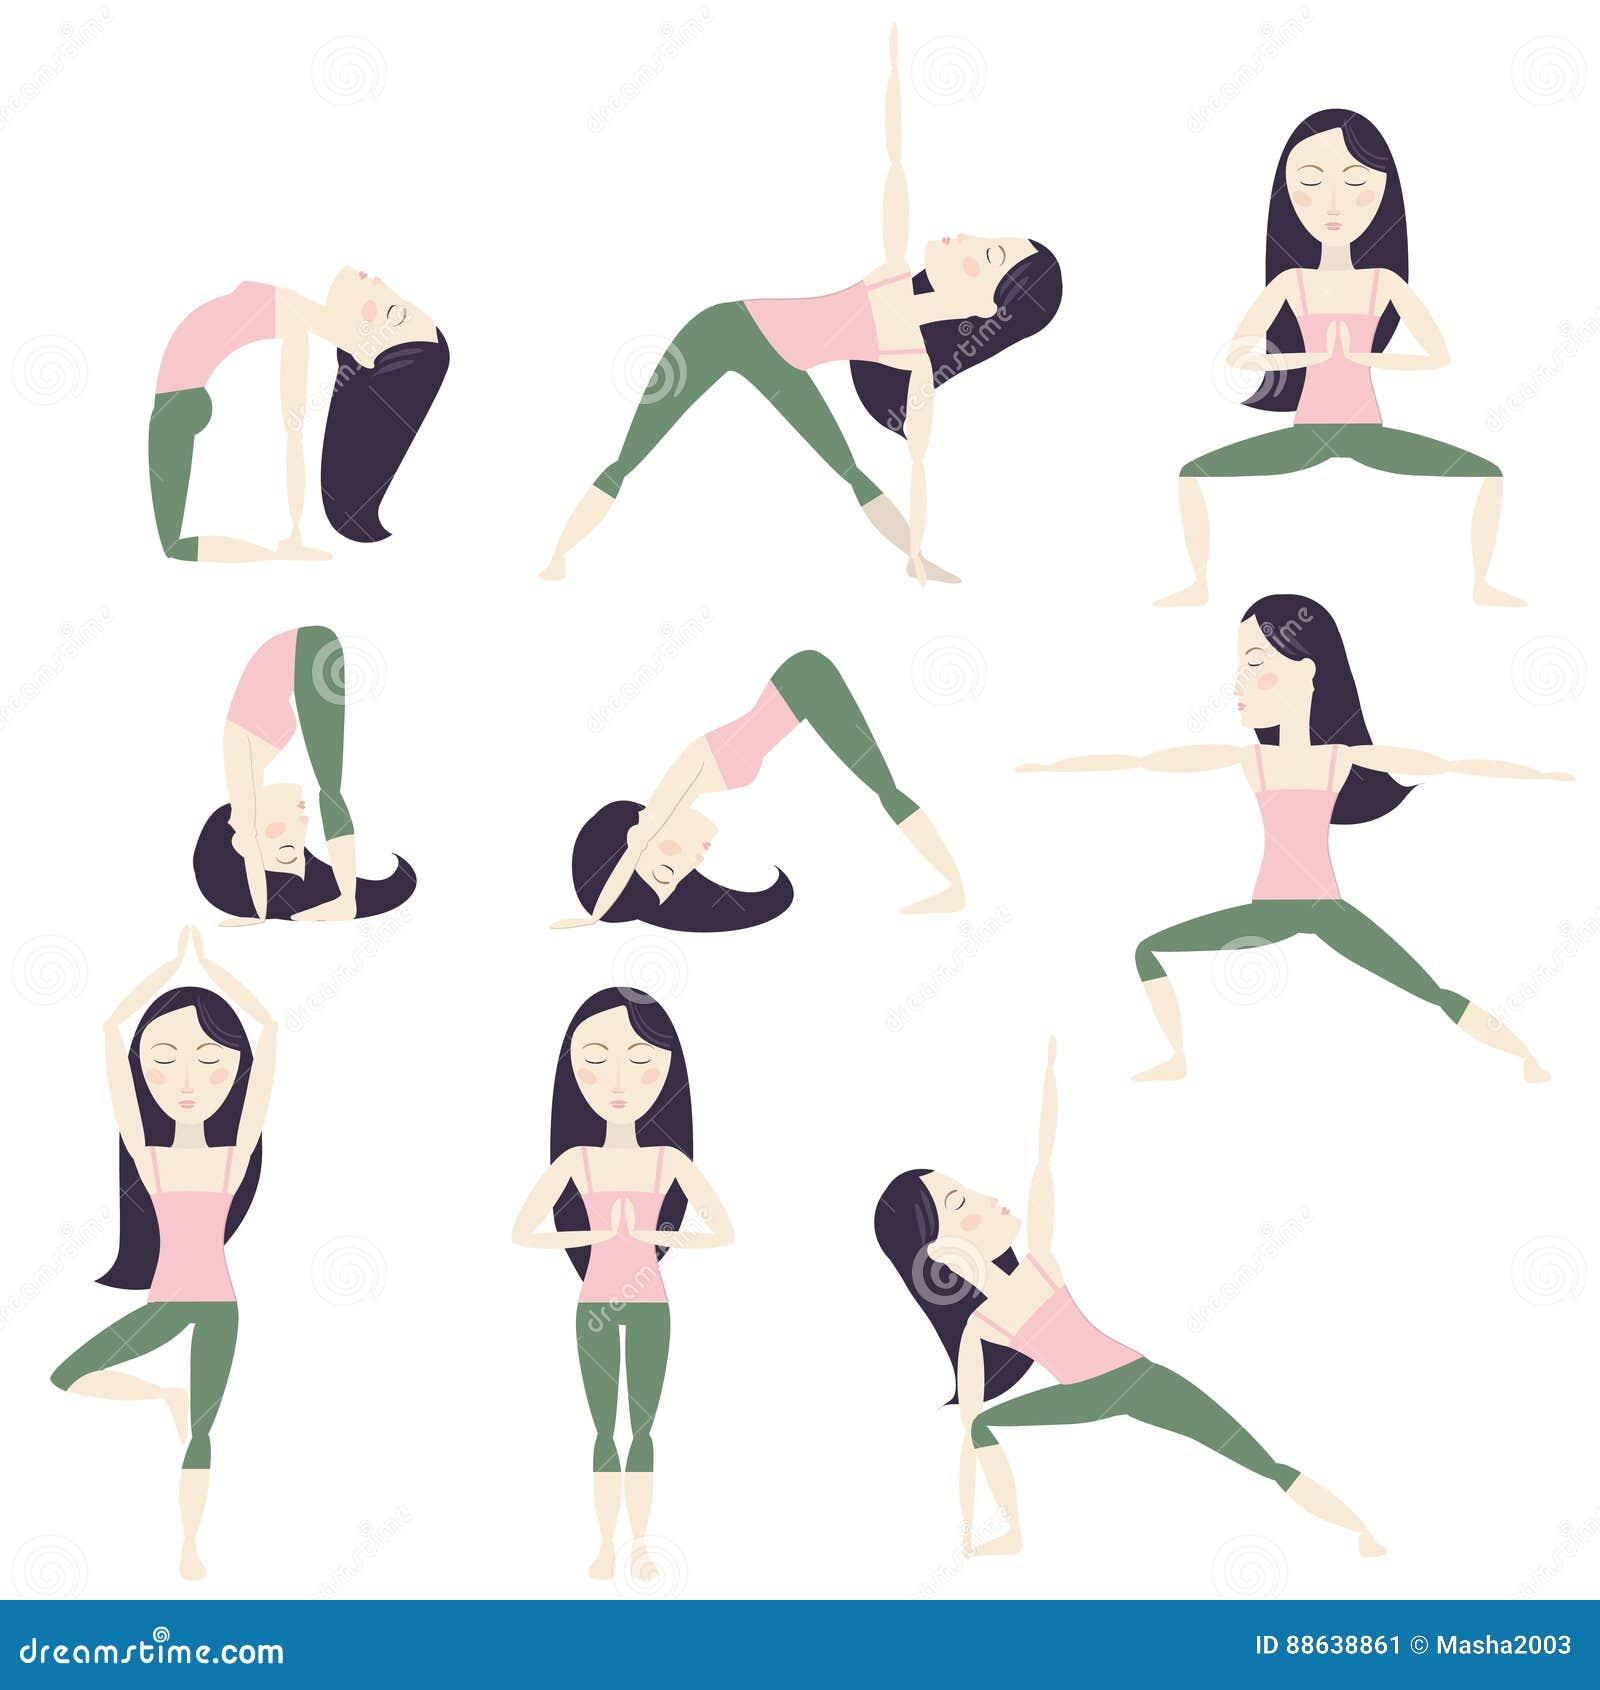 Cartoon Yoga Poses Stock Vector Illustration Of Black 88638861